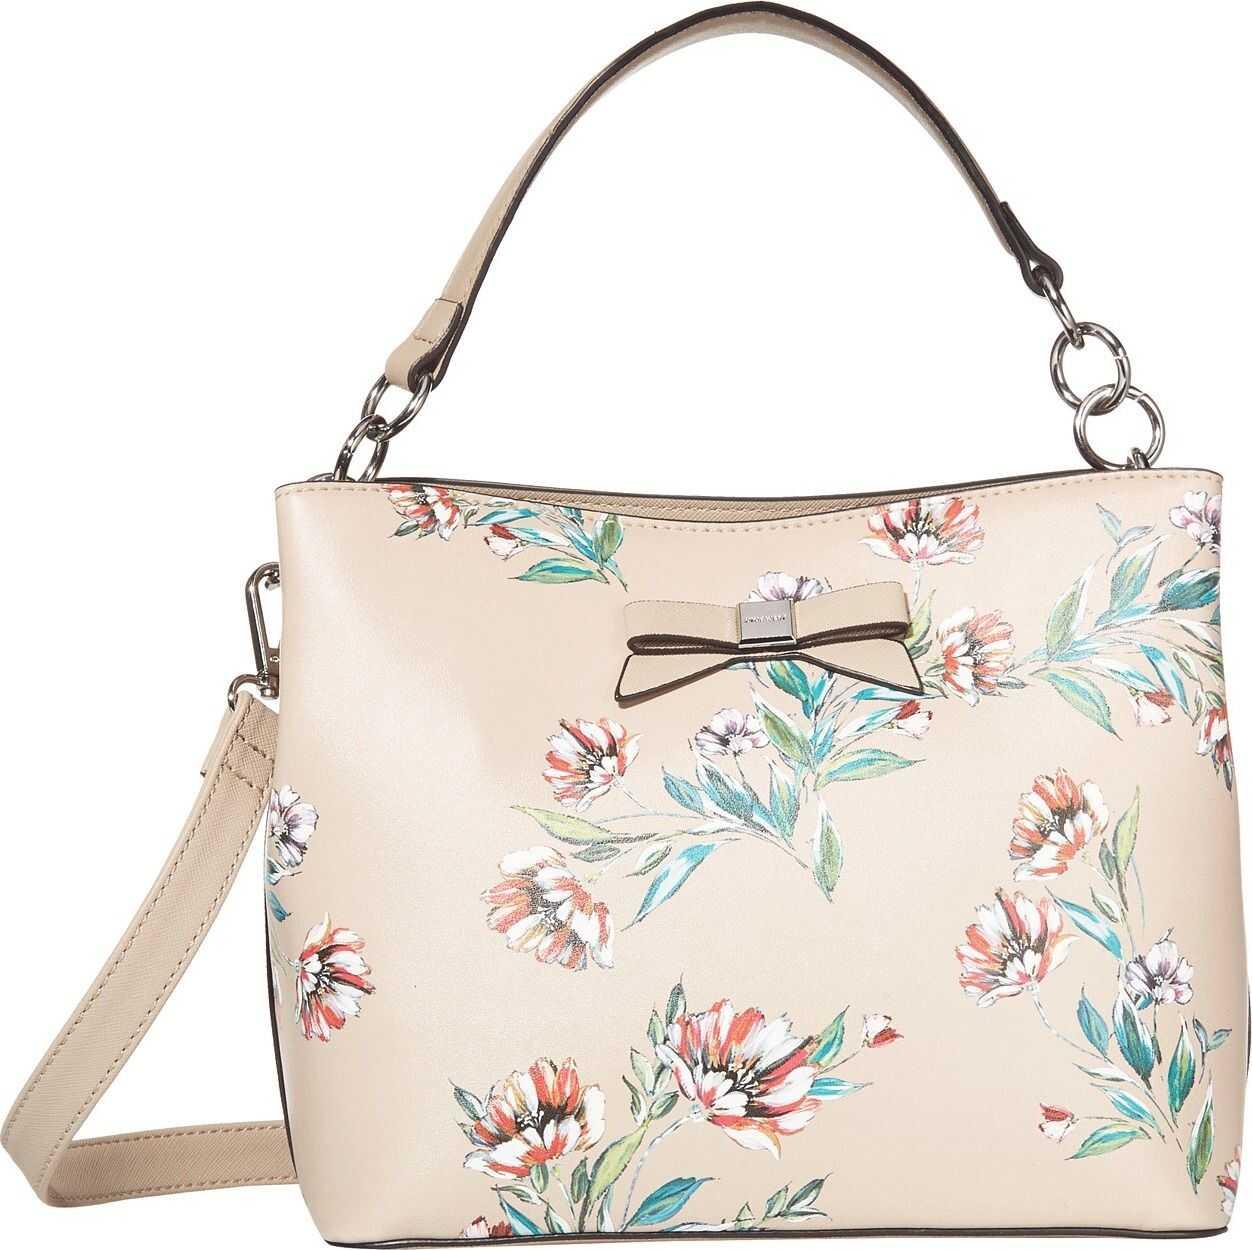 Nine West Maile Bucket Bag Fawn Multi